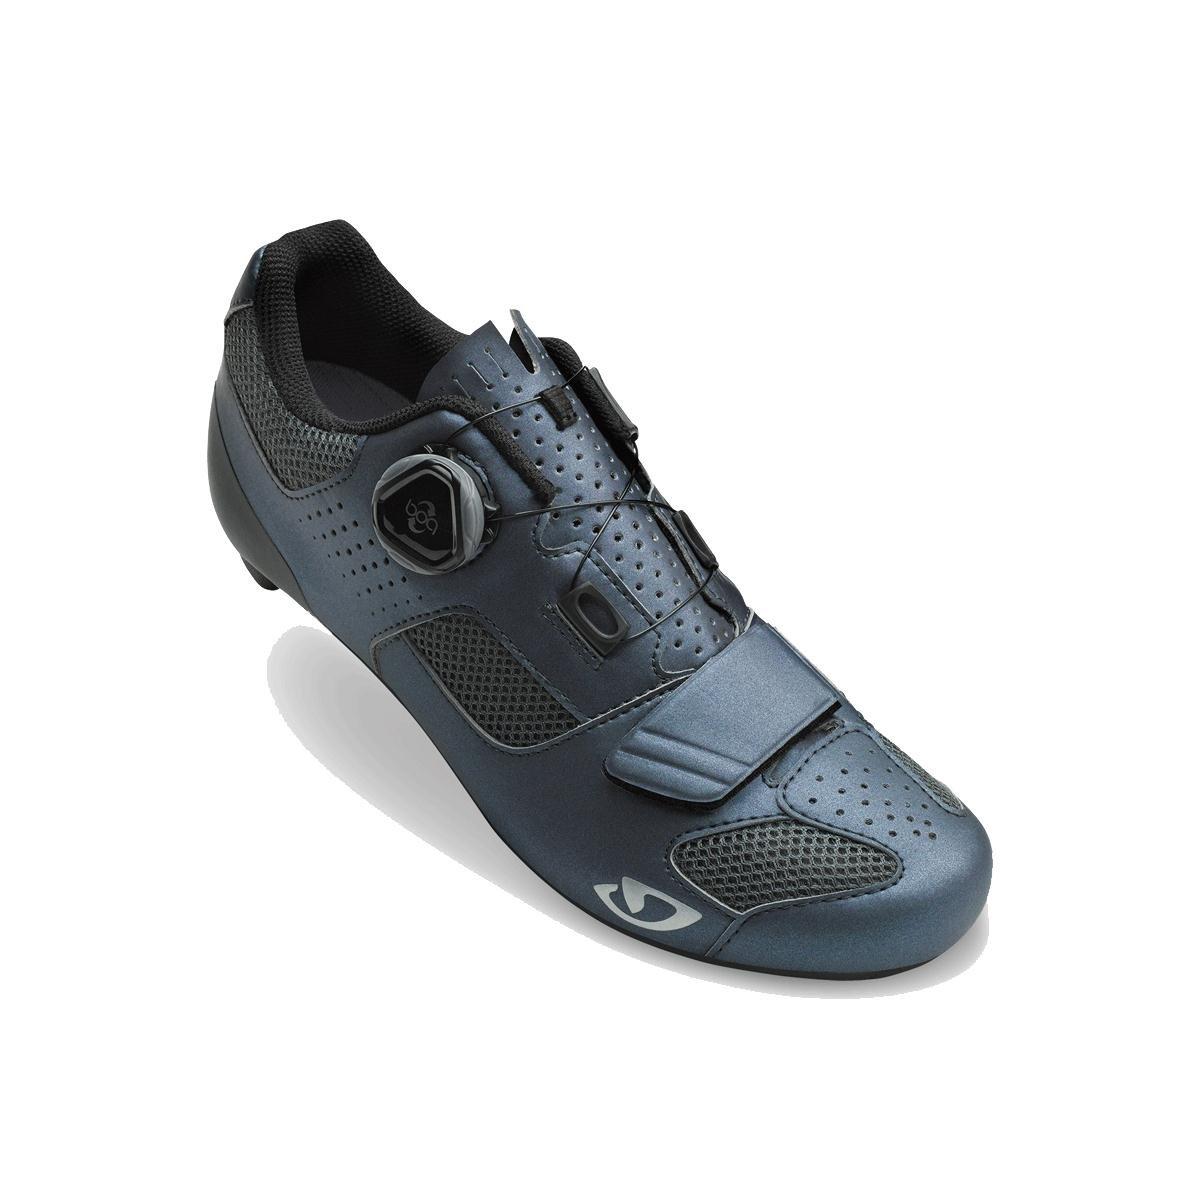 Giro 2018レディースEspada Boaサイクリング靴 – メタリックチャコール/シルバー B076B9YKLB 42|Metallic Charcoal/Silver Metallic Charcoal/Silver 42